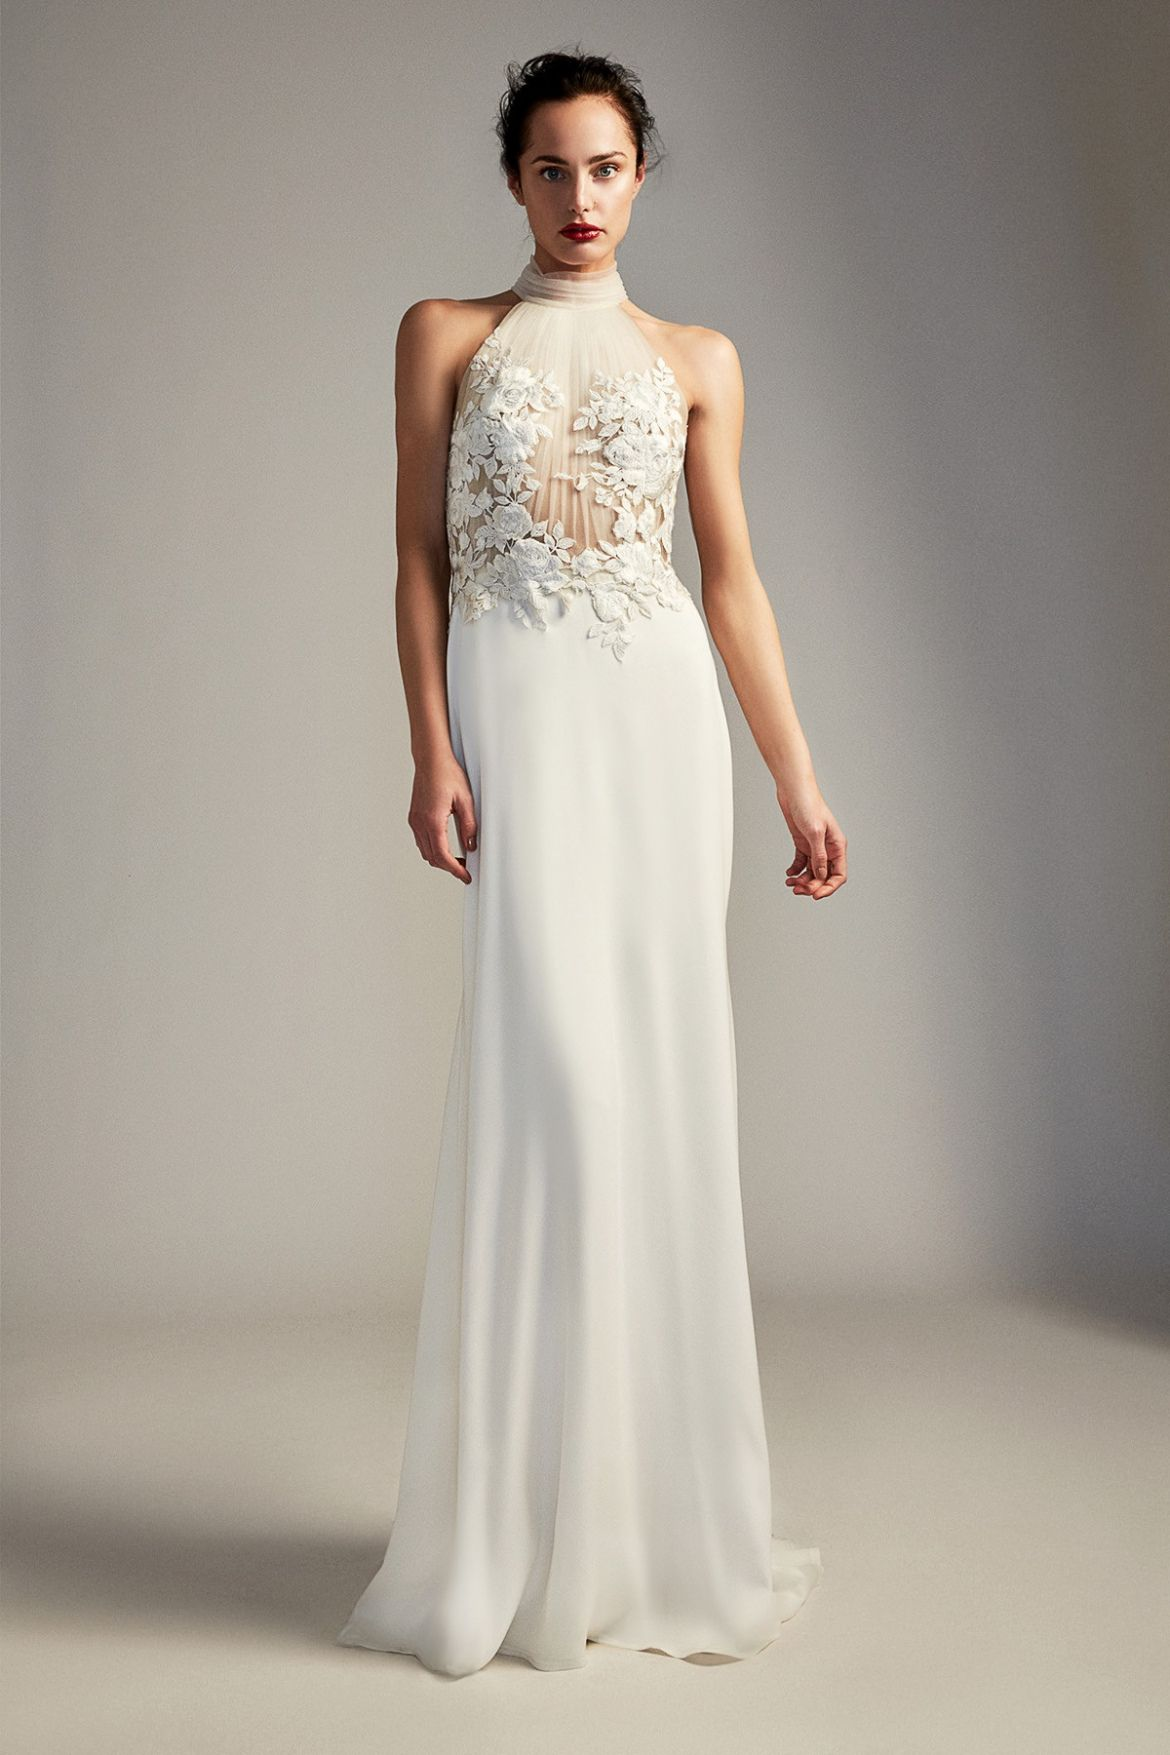 20+ Tadashi Shoji Wedding Dresses - Plus Size Dresses for Wedding ...